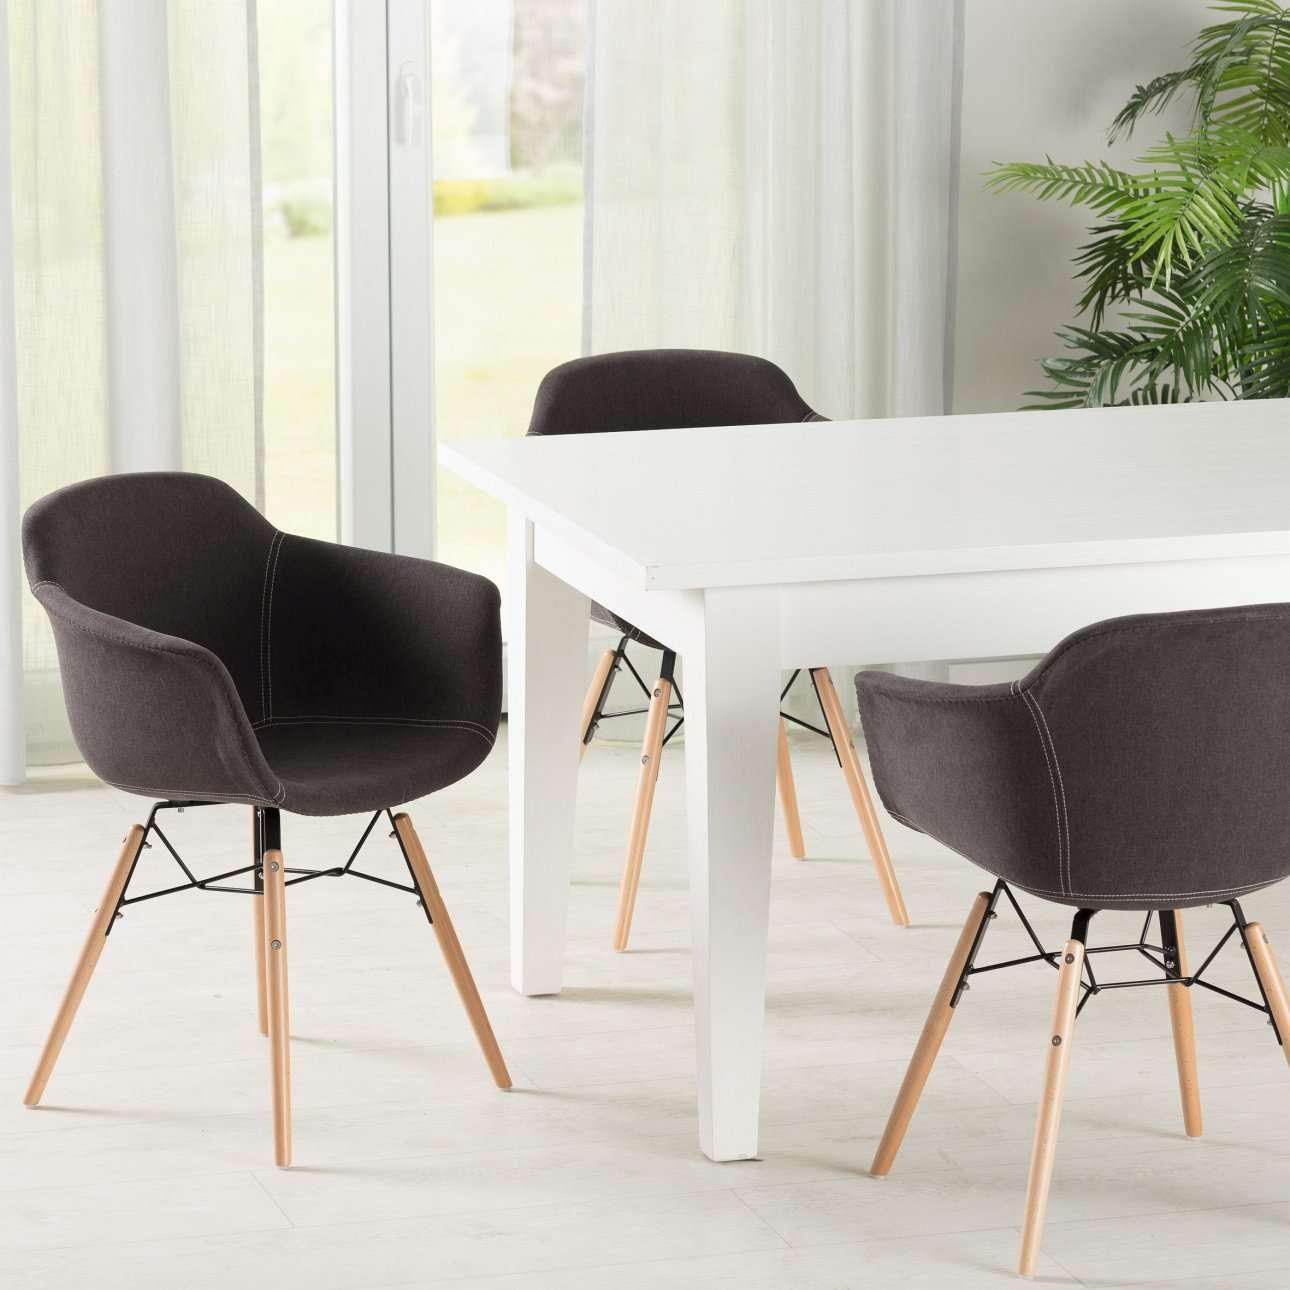 polsterstuhl sogo brown 80x38x58cm dekoria. Black Bedroom Furniture Sets. Home Design Ideas